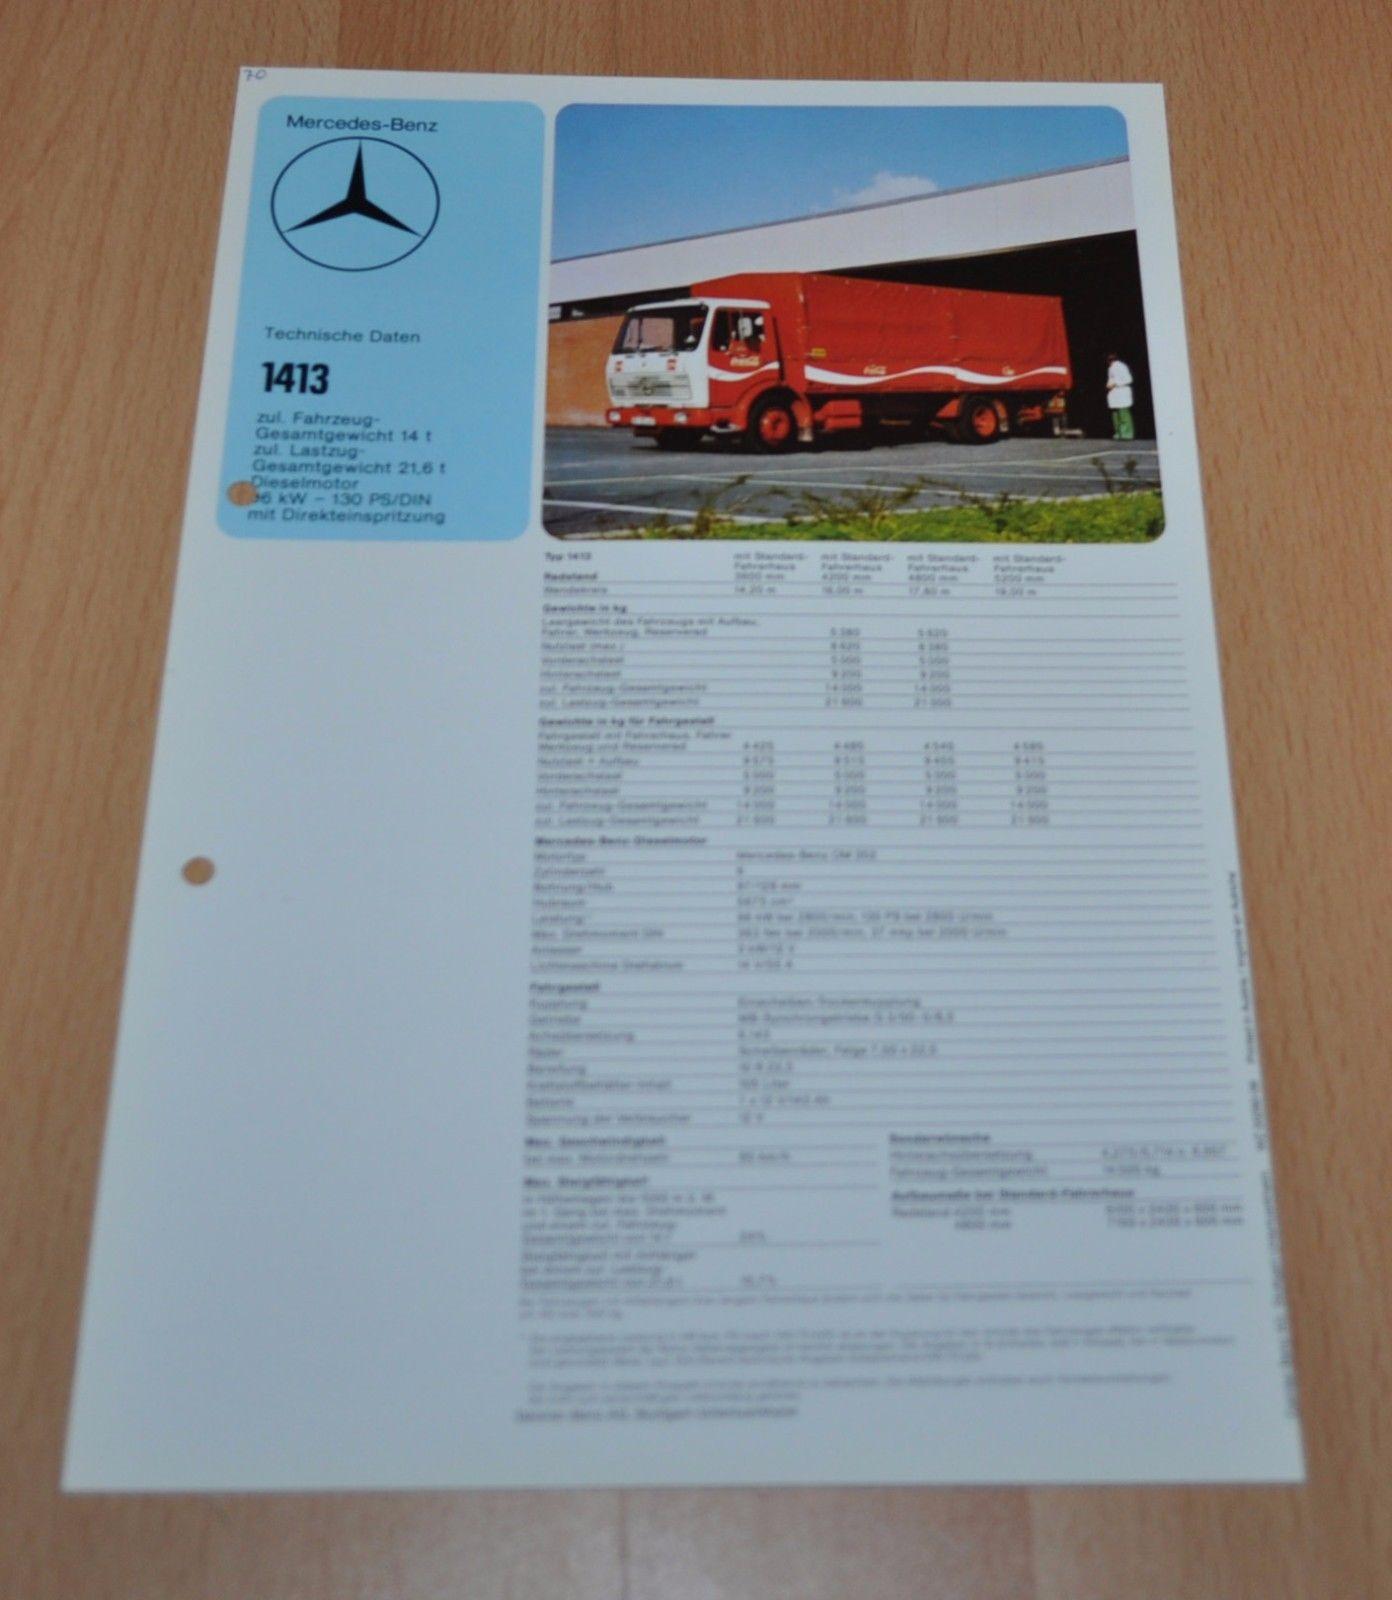 Mercedes Benz 1413 Specification Coca Cola Coke LKW Truck Brochure Prospekt  - AUTO BROCHURE